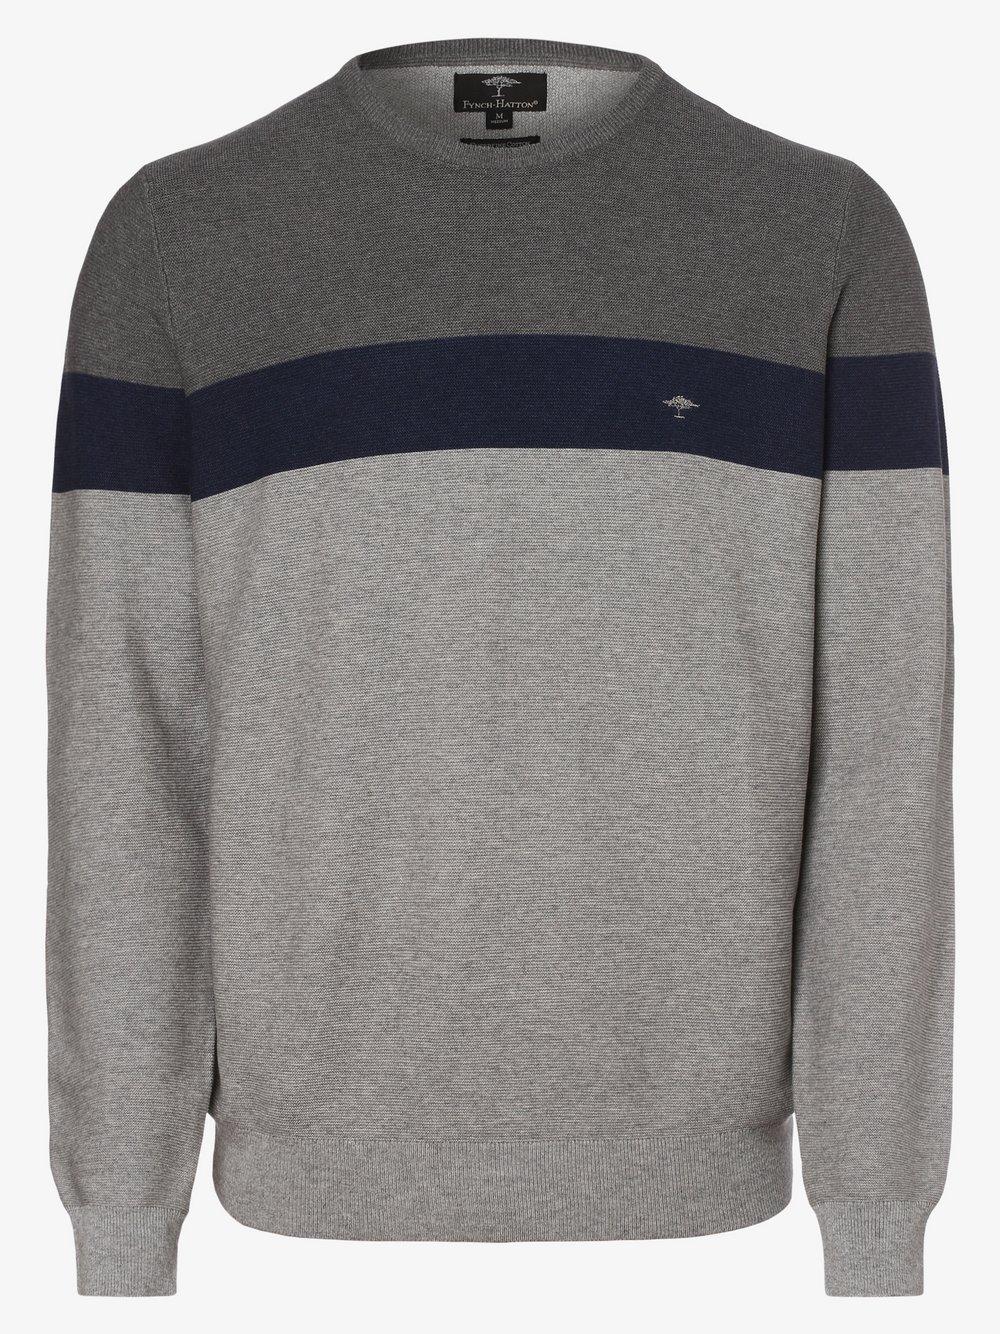 Fynch-Hatton – Sweter męski, szary Van Graaf 464099-0001-09990